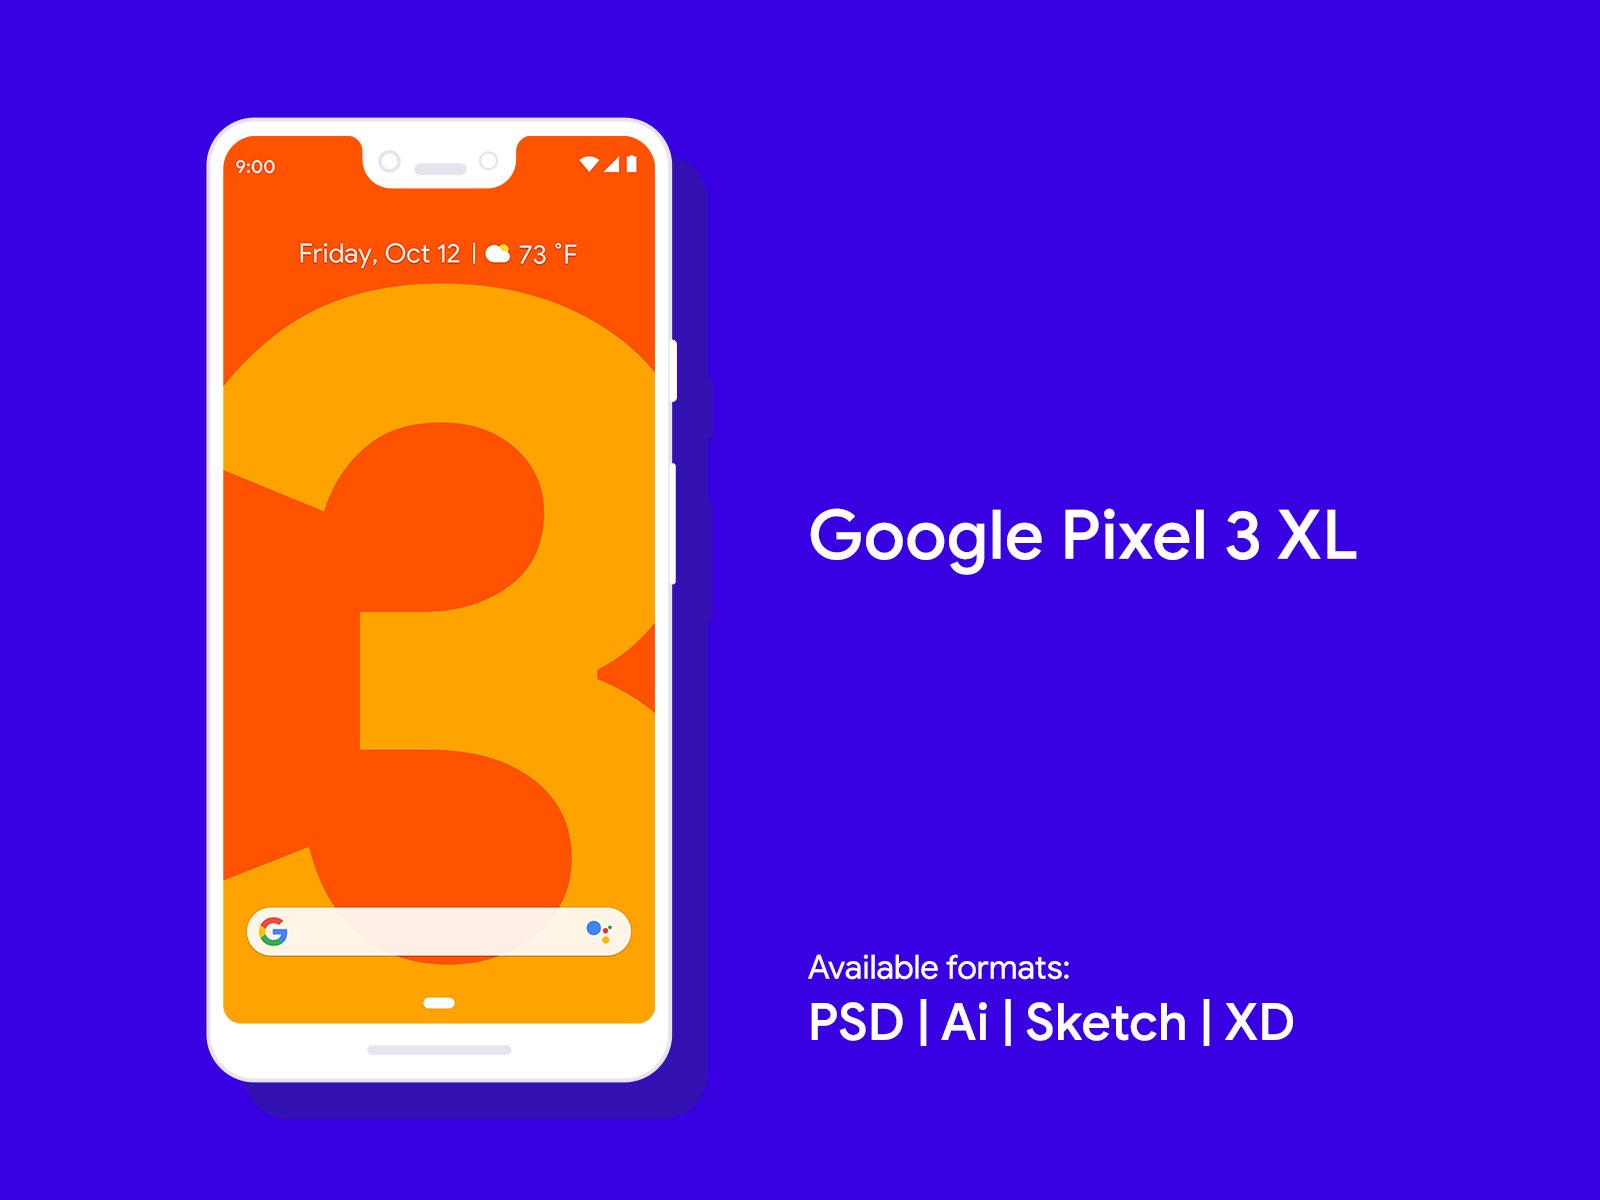 Free-Google-Pixel-3-&-Google-Pixel-3-XL-Mockup-PSD-Sketch-XD-Ai